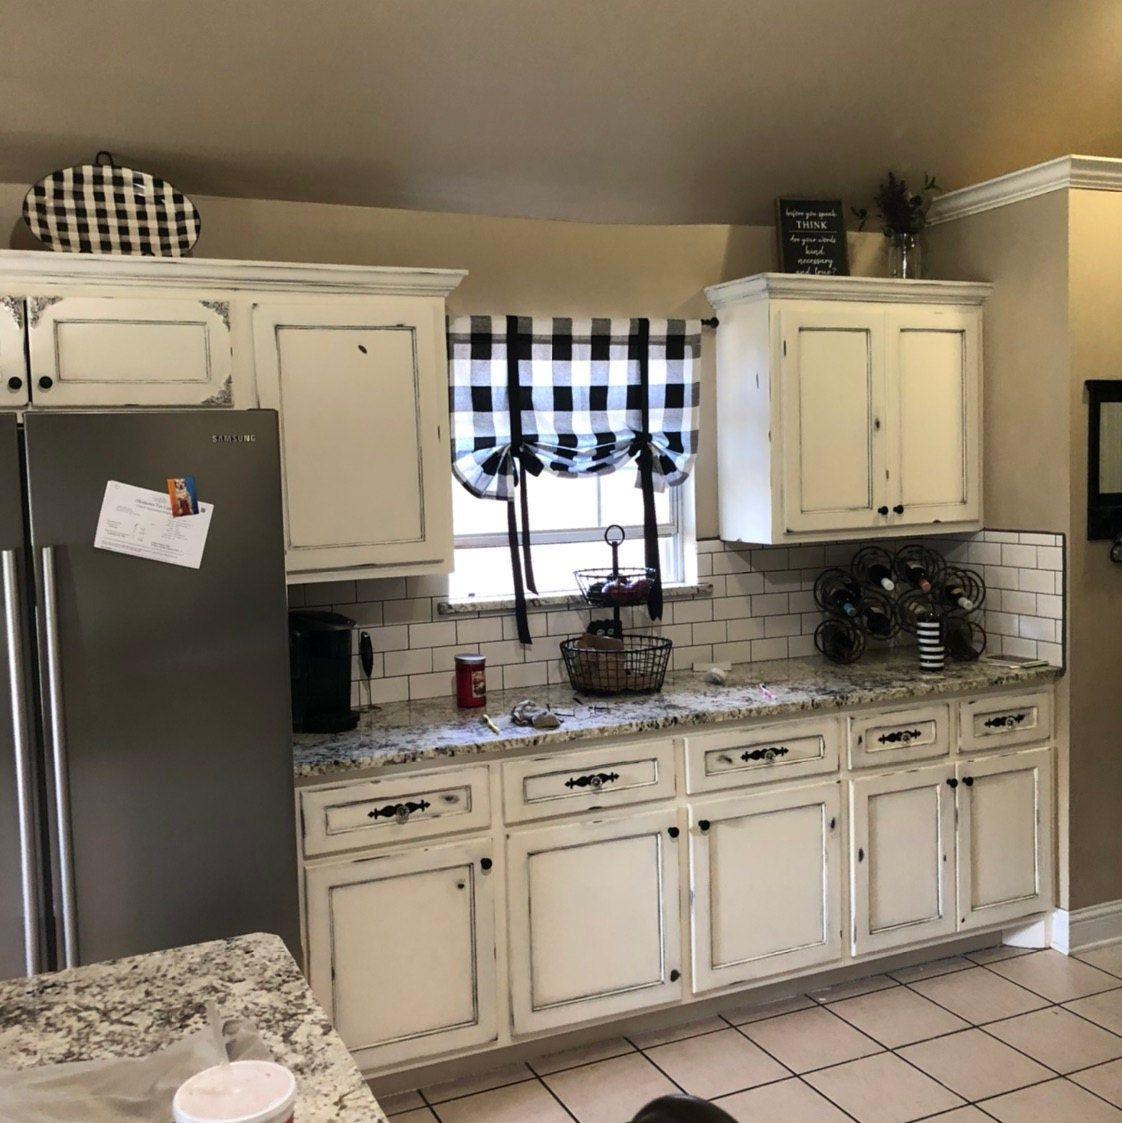 Black And White Bufflo Check Tie Up Shade Designer Valance Etsy In 2020 Kitchen Decor Kitchen Design Kitchen Remodel